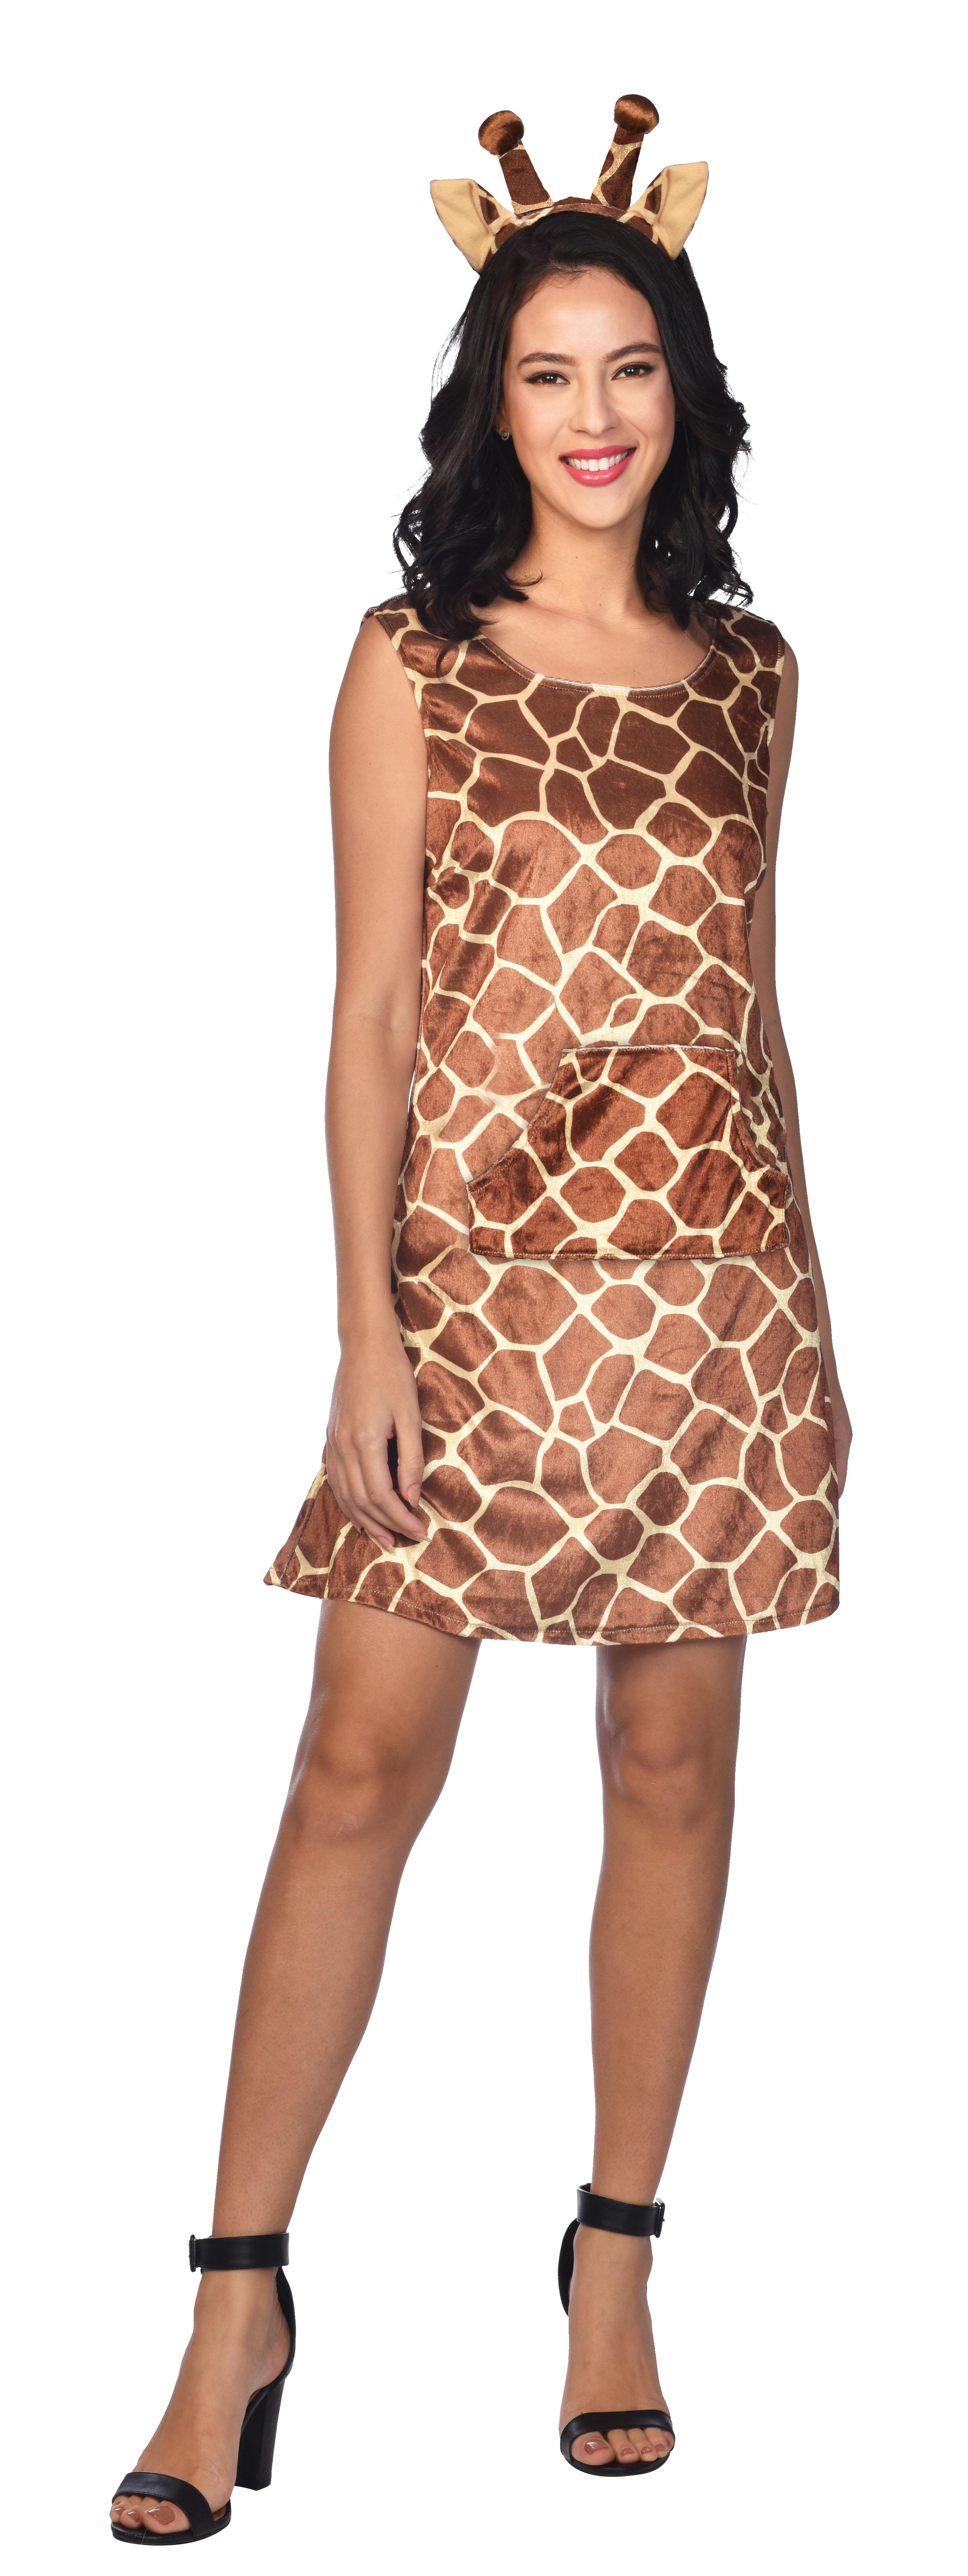 Indexbild 21 - Adult Ladies Zoo Safari Animal Giraffe Lady Fancy Dress Costume Womens Outfit